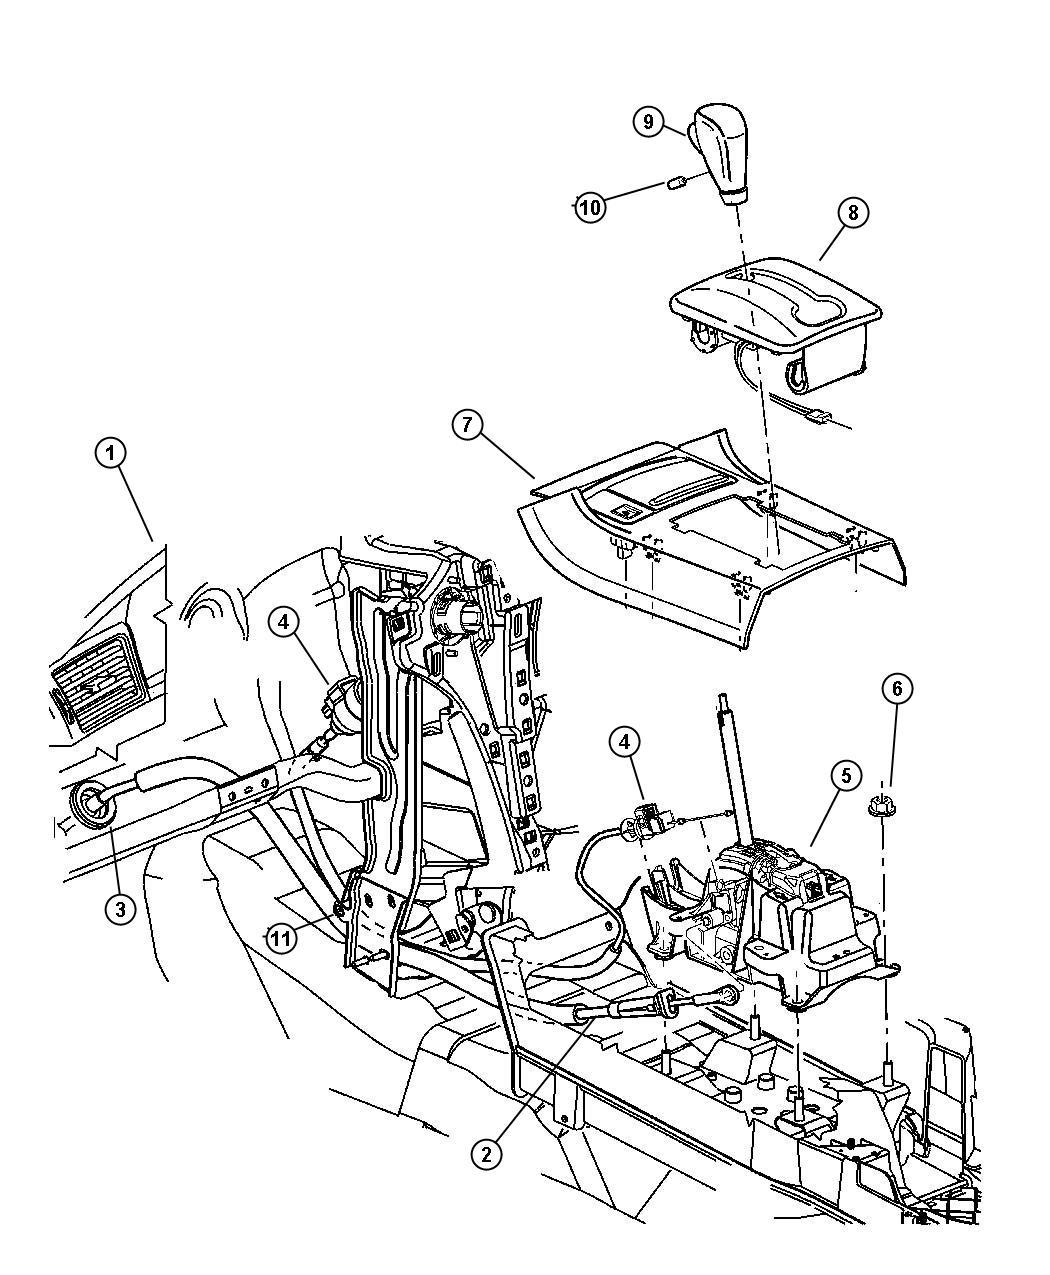 Chrysler Pacifica Knob Gearshift Trim All Trim Codes Color No Description Available